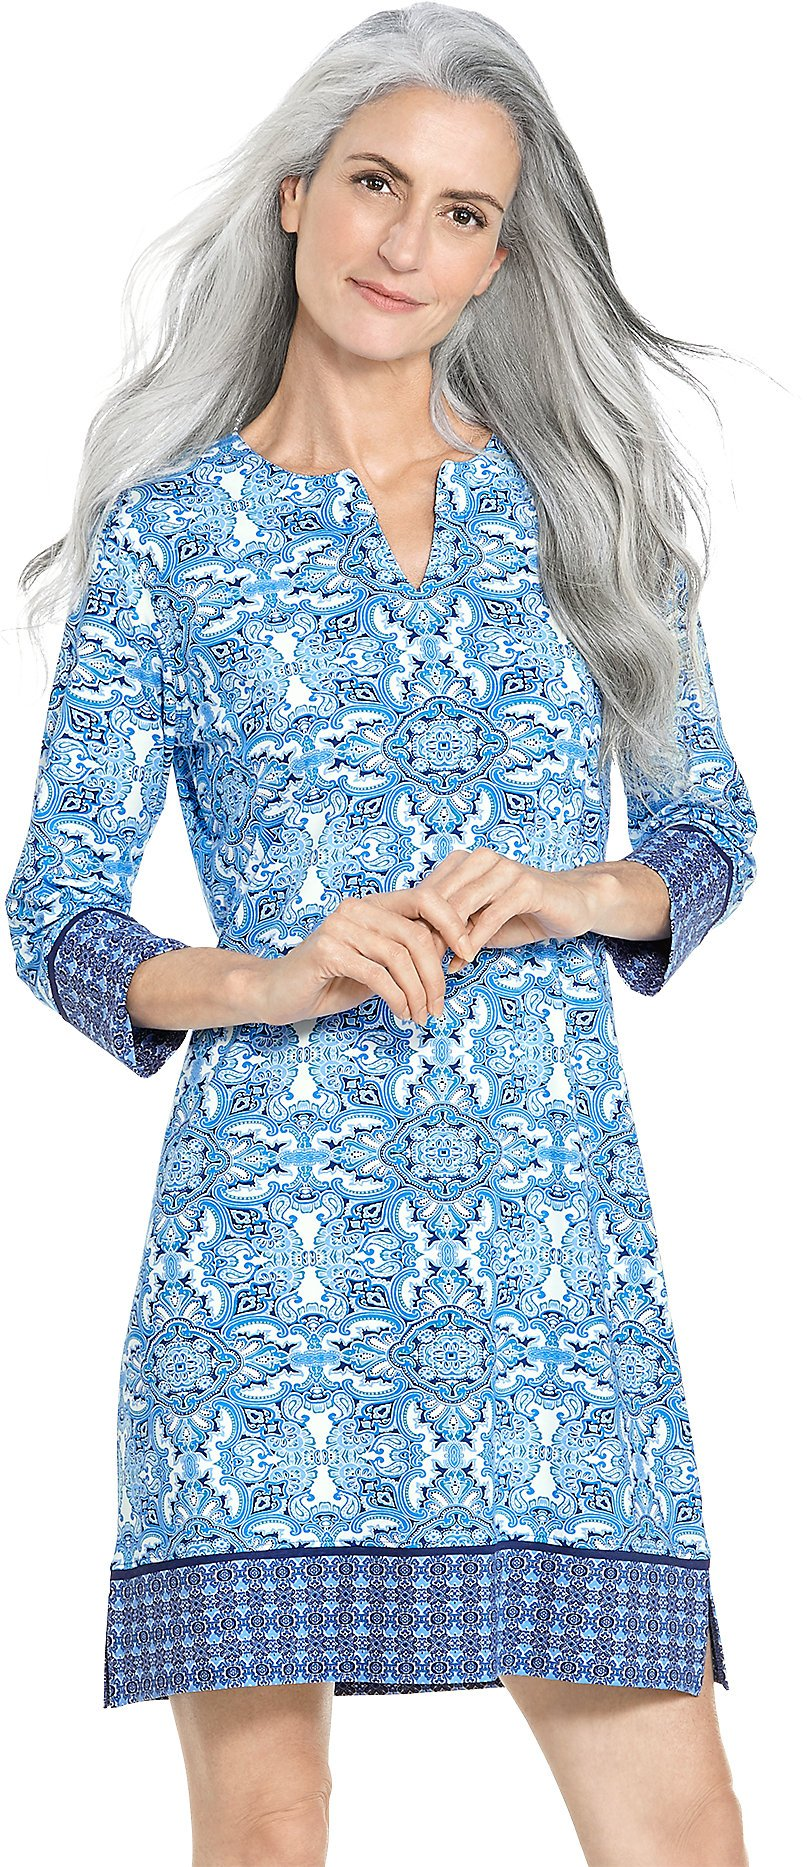 Coolibar UPF 50+ Women's Oceanside Tunic Dress - Sun Protective (2X- Brilliant Blue Midsummer Medallion)